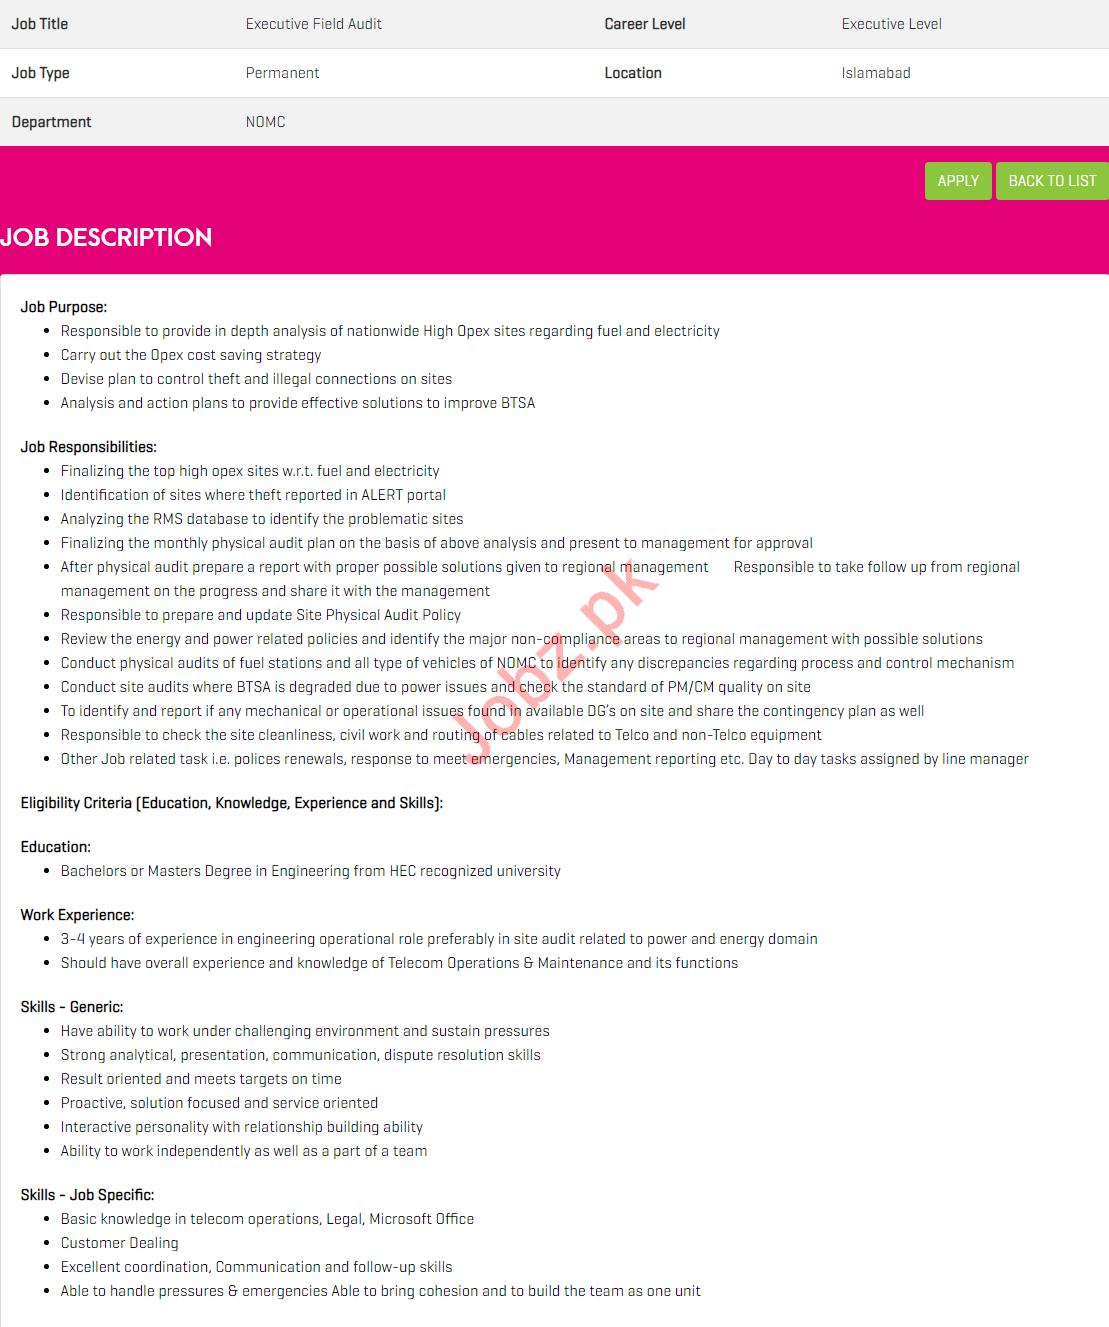 Executive Field Audit Jobs in Zong Pakistan